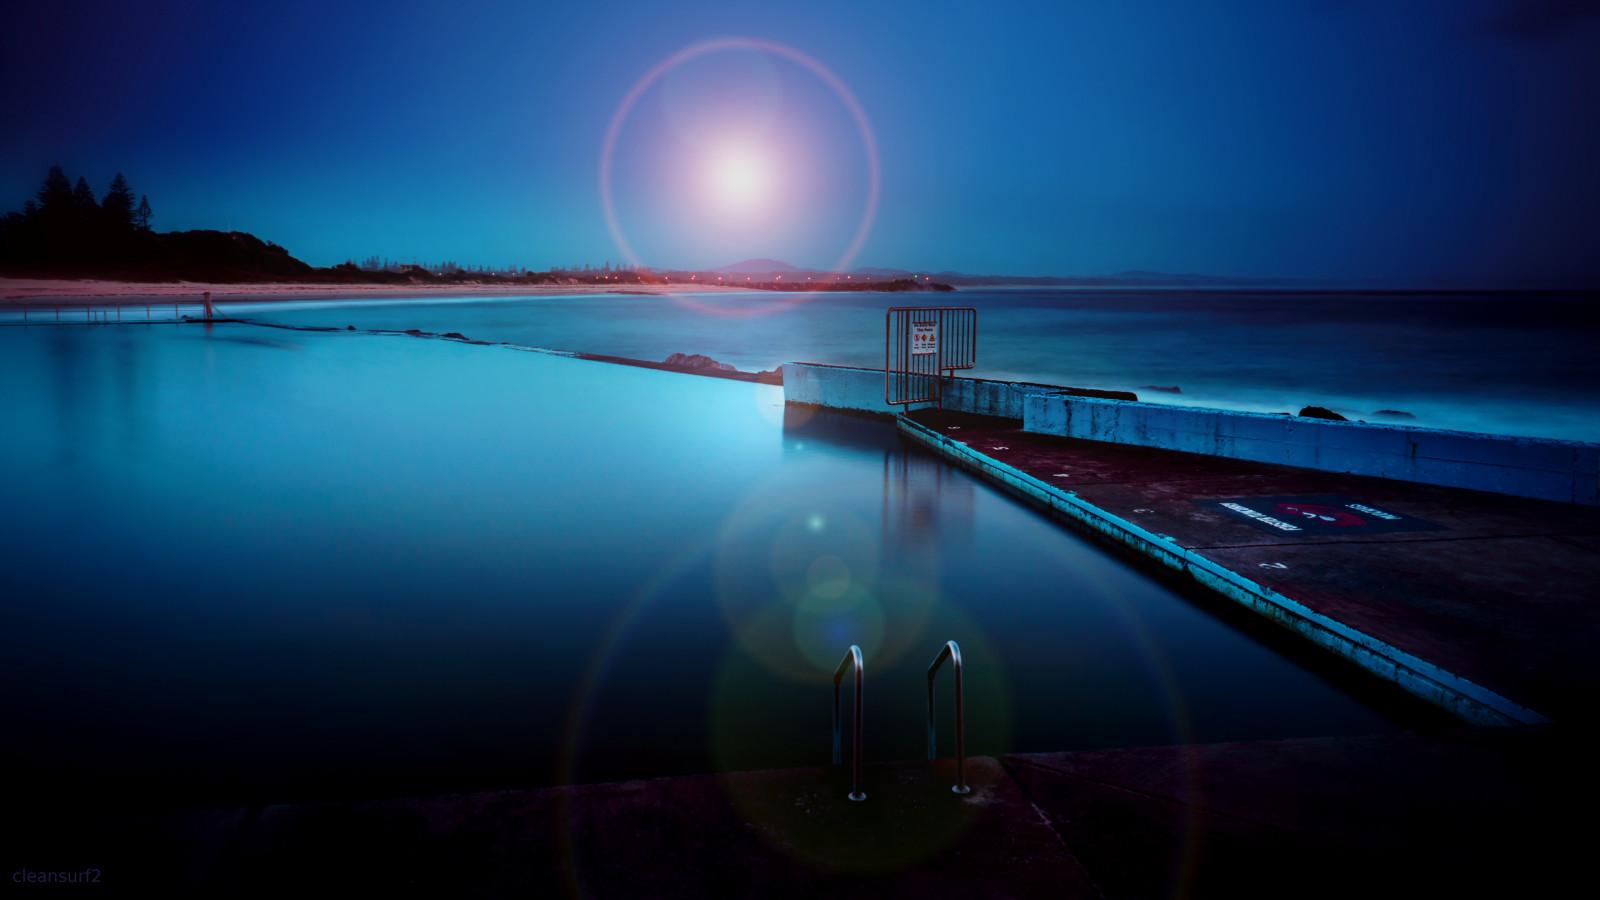 Sfondi oceano longexposure blu leggero mare sfondo for Piscina fondo nero